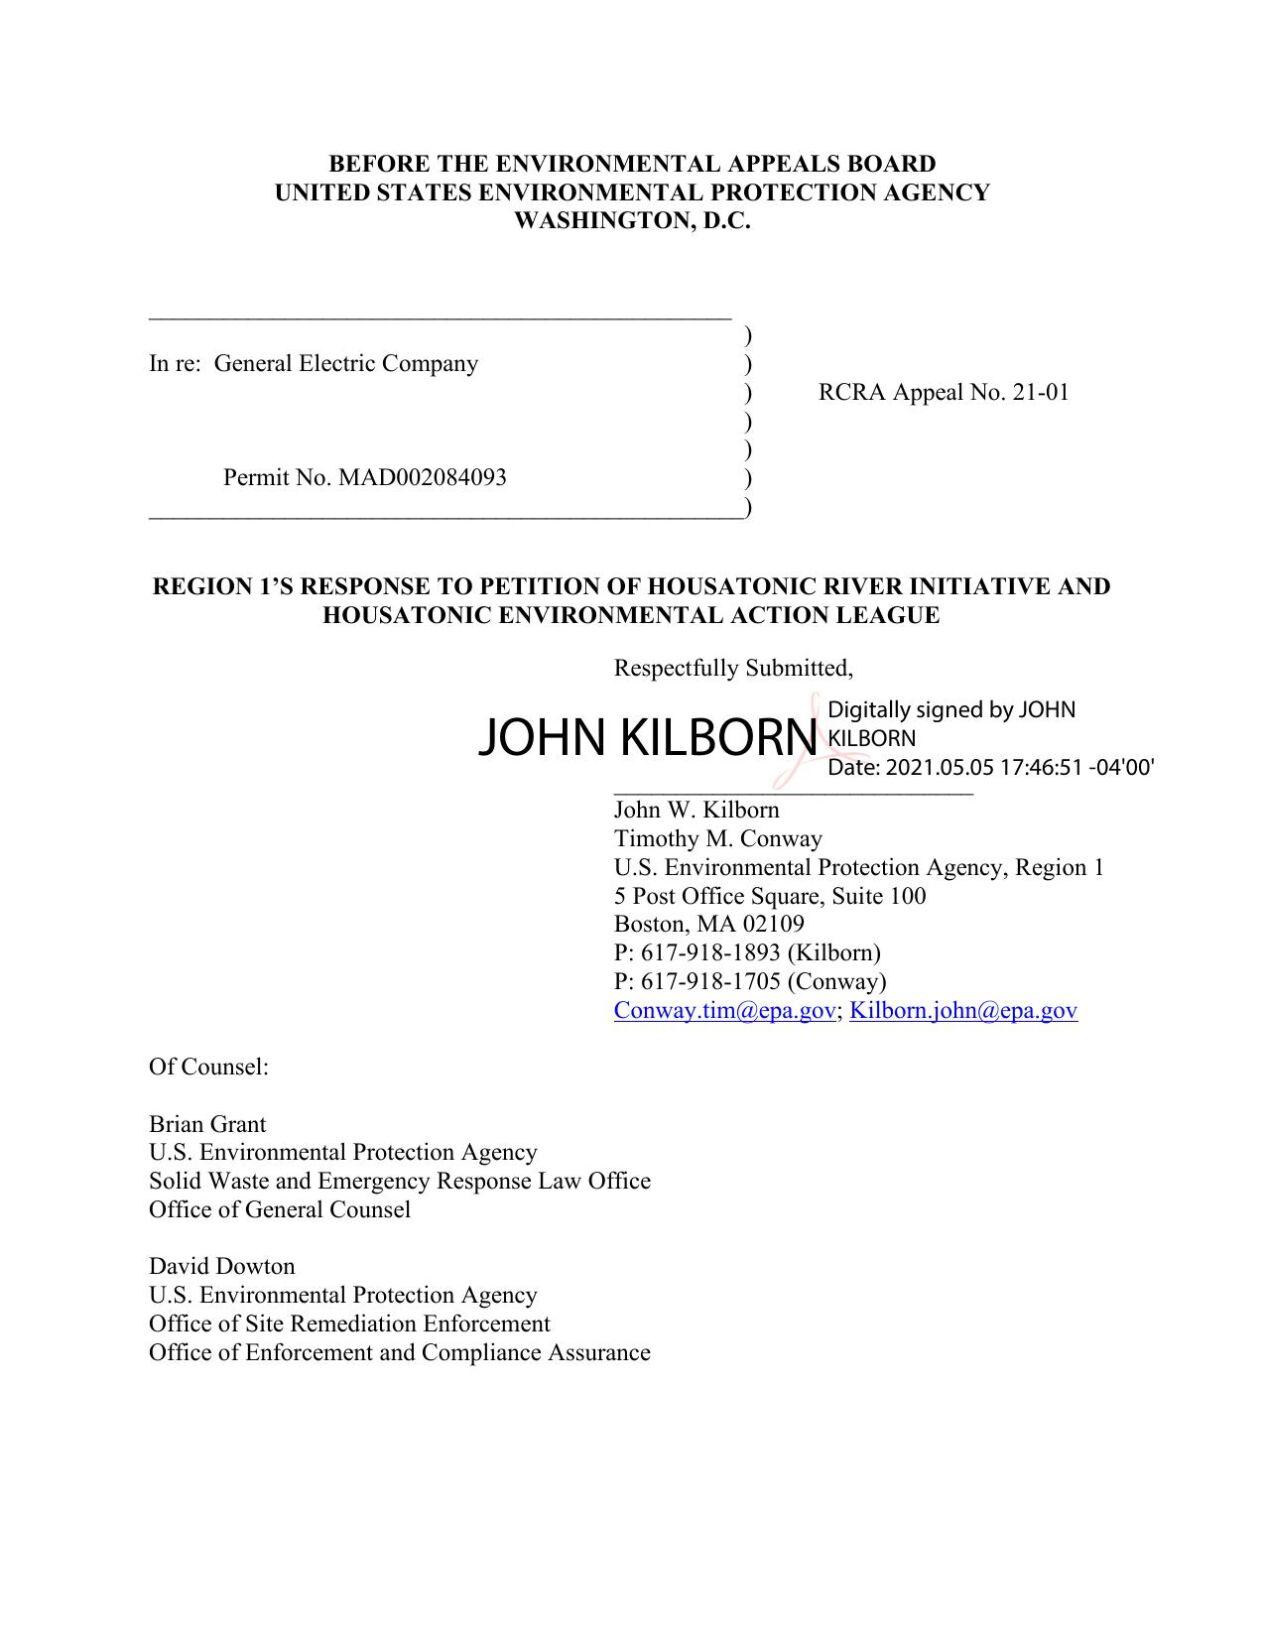 EPA Response to Petition